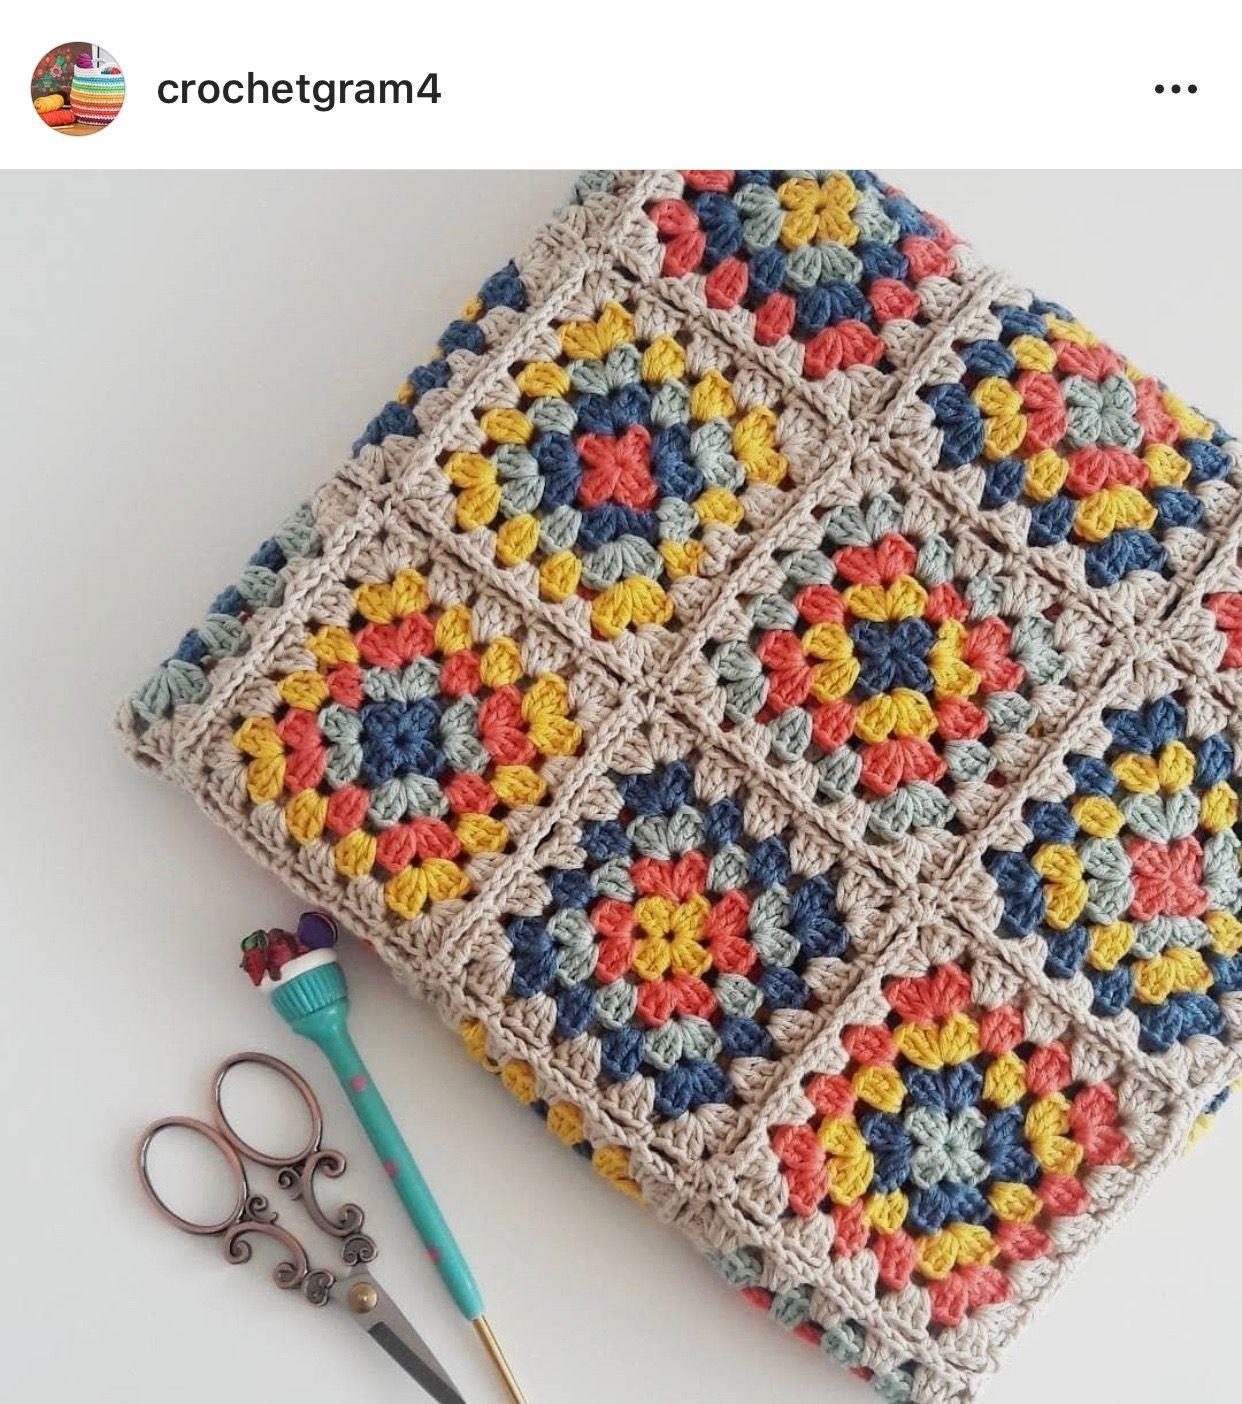 Pin de Amy Rich en Crochet | Pinterest | Cobija, Ganchillo y ...